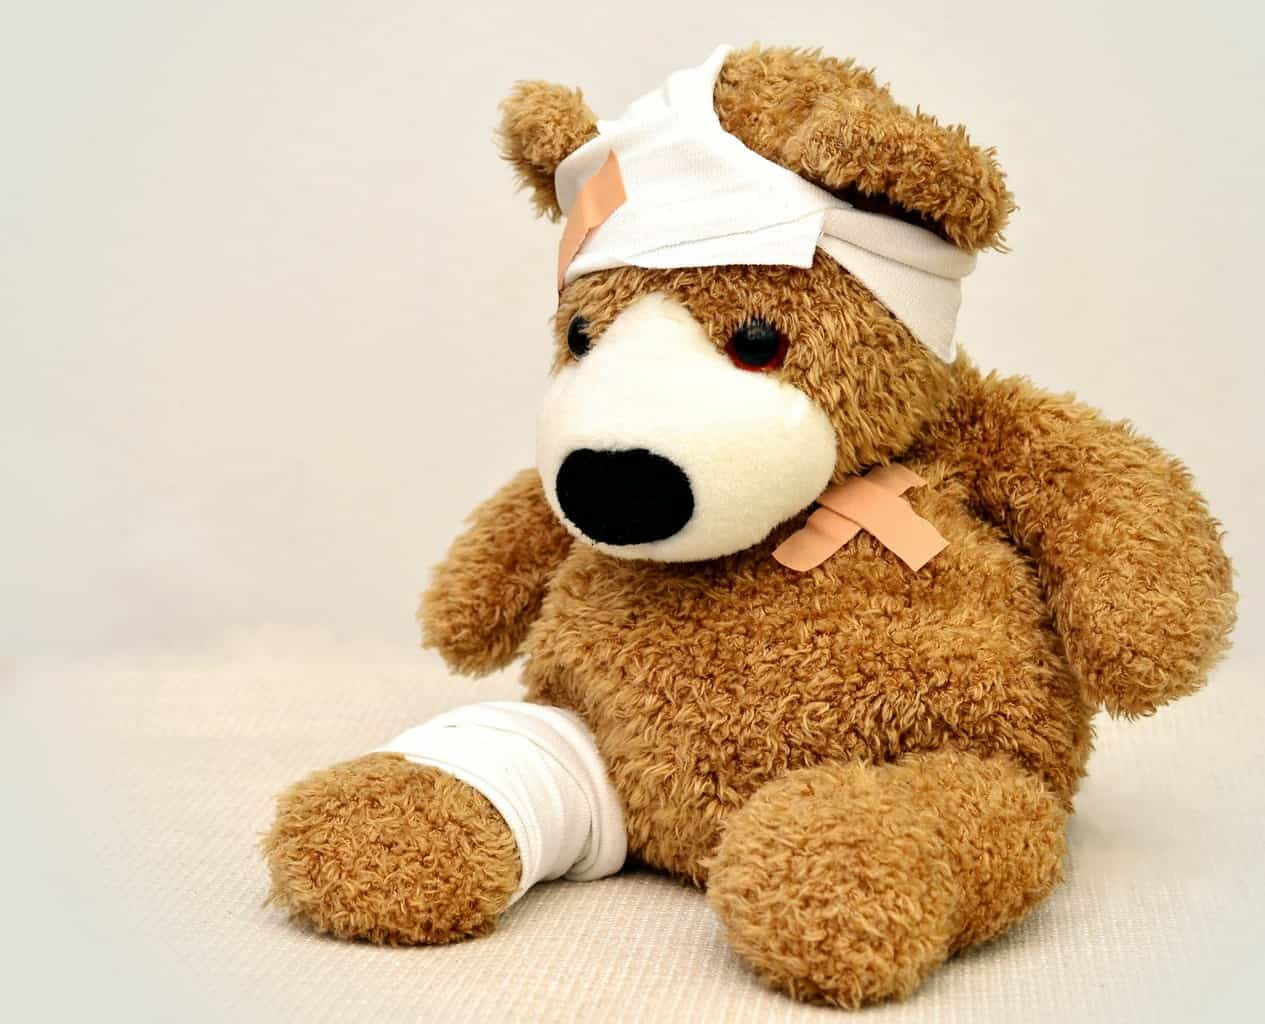 My Minor Child Got Injured: Is Lawsuit an Option?